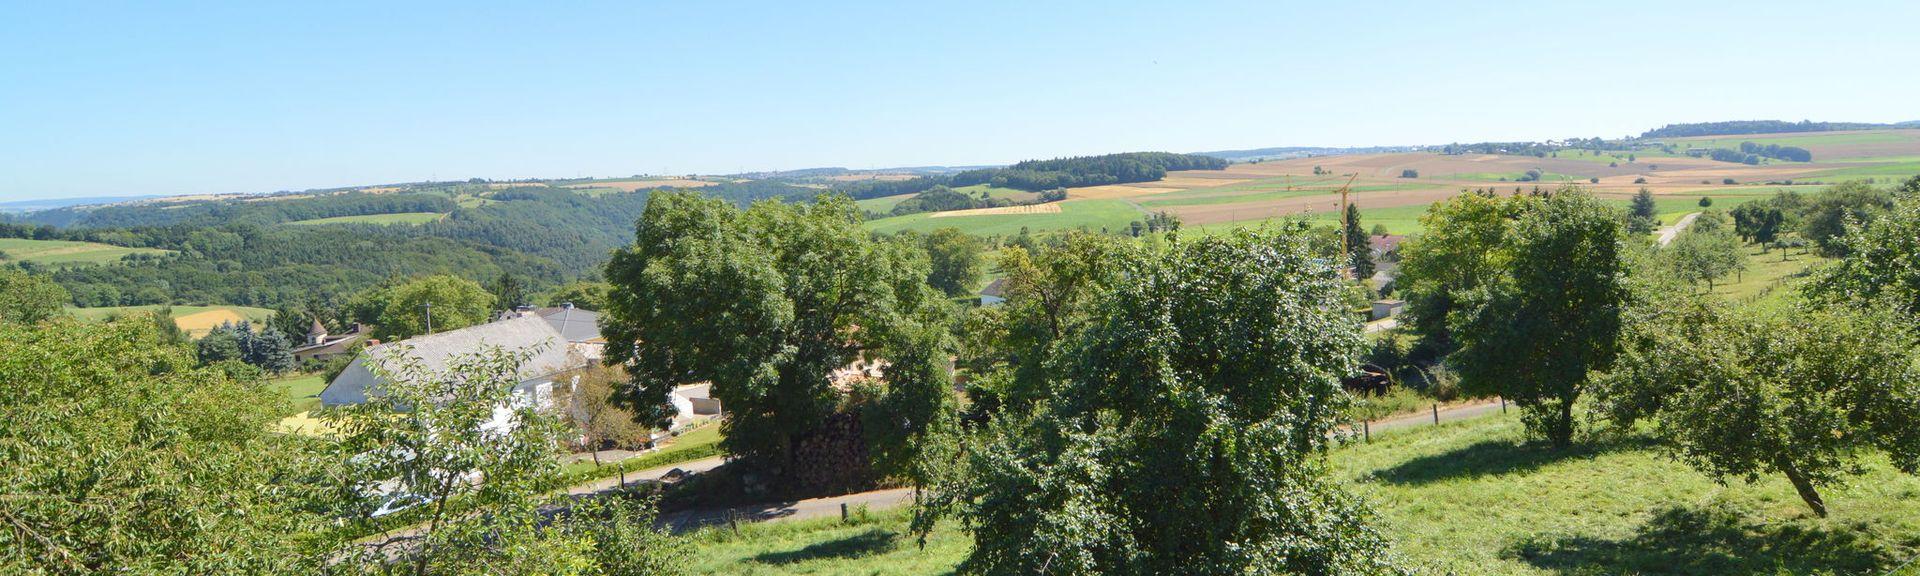 Ittel, Welschbillig, Rhineland-Palatinate, Germany